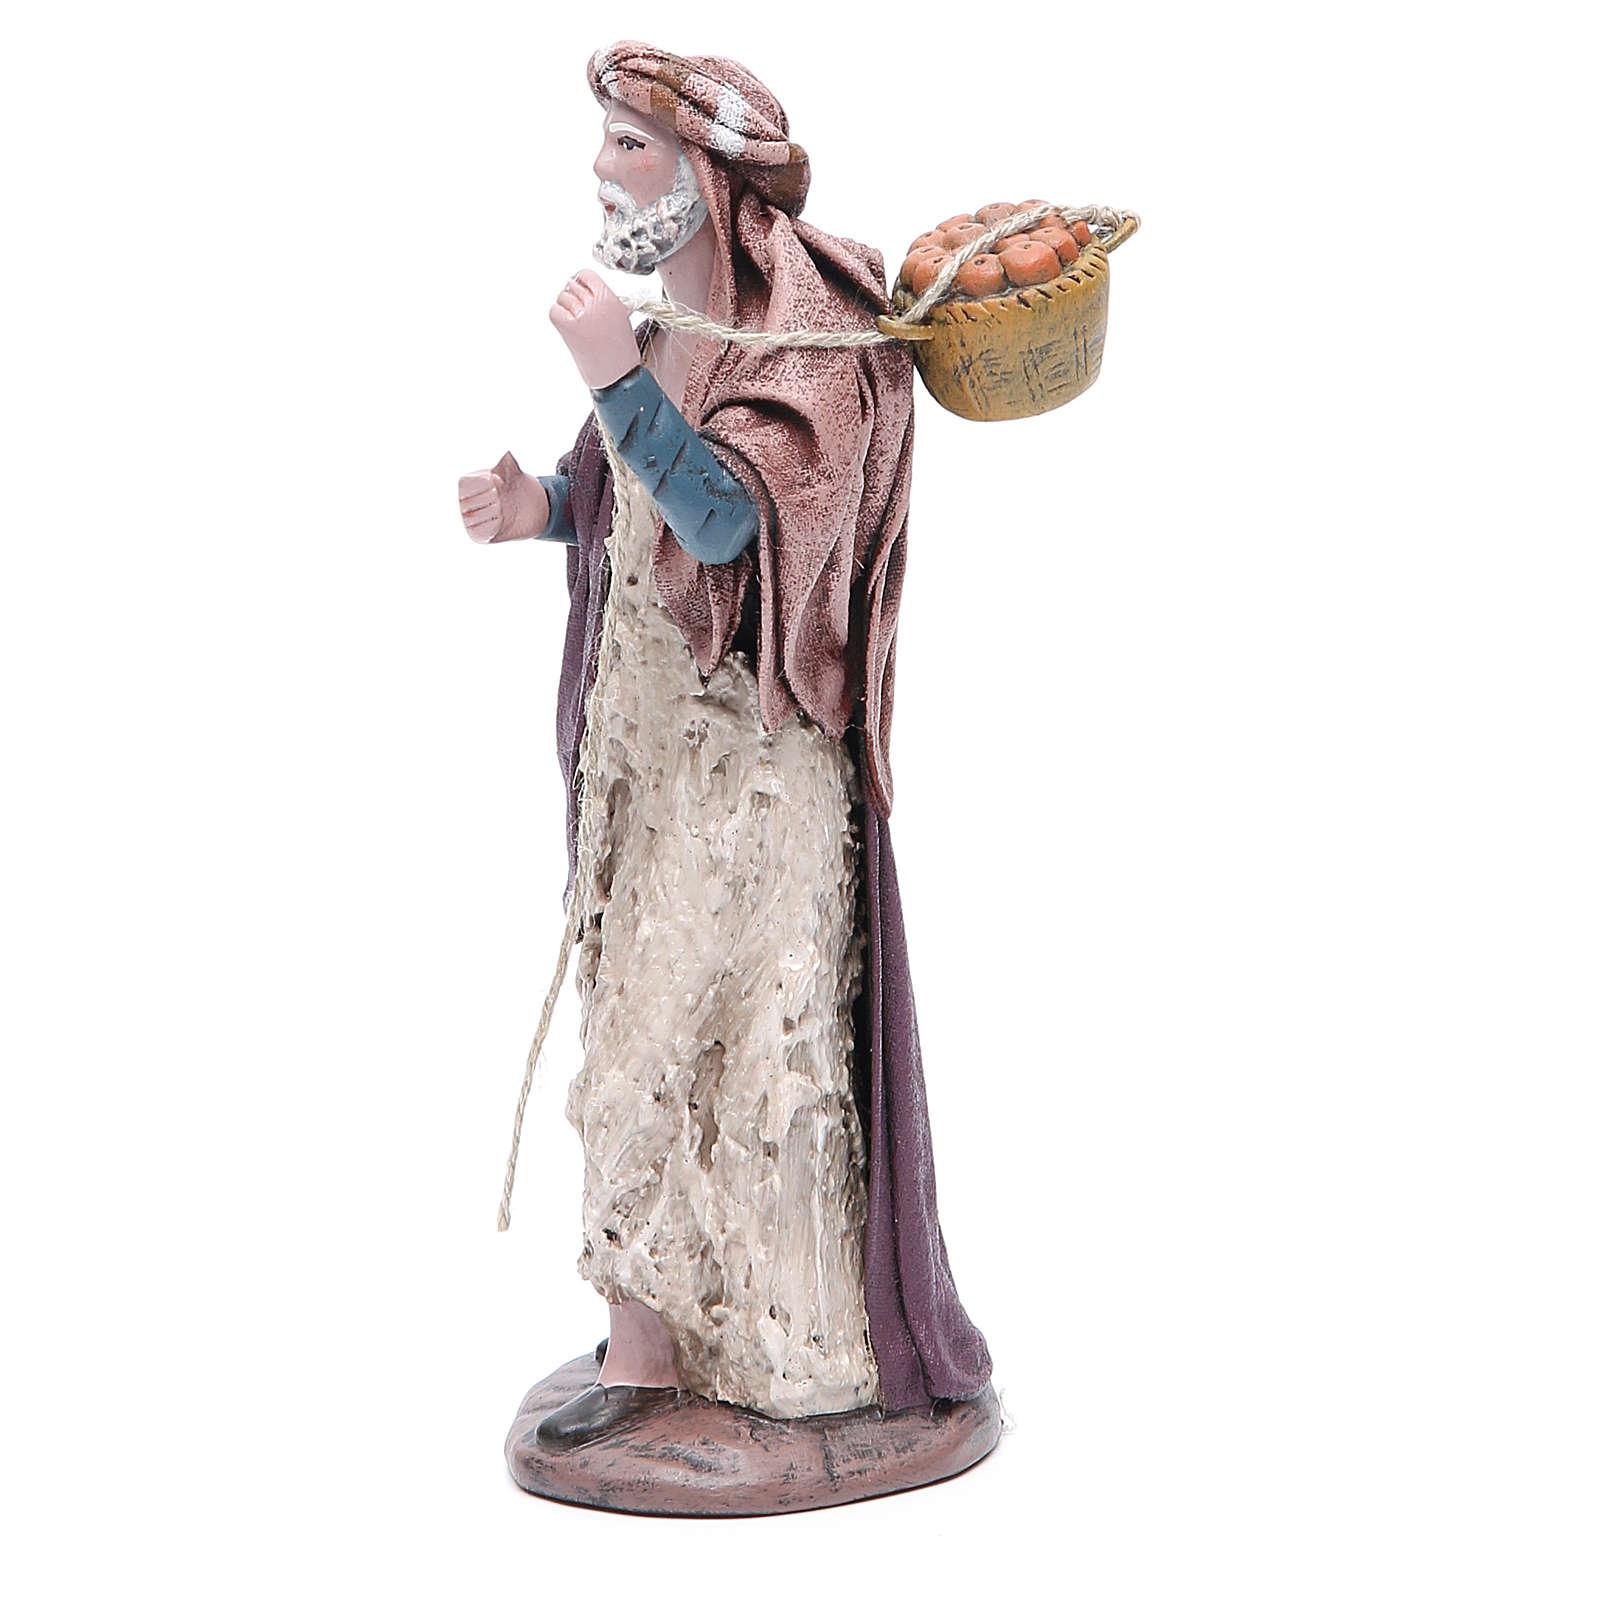 Pastore con cesta presepe terracotta 17 cm 3